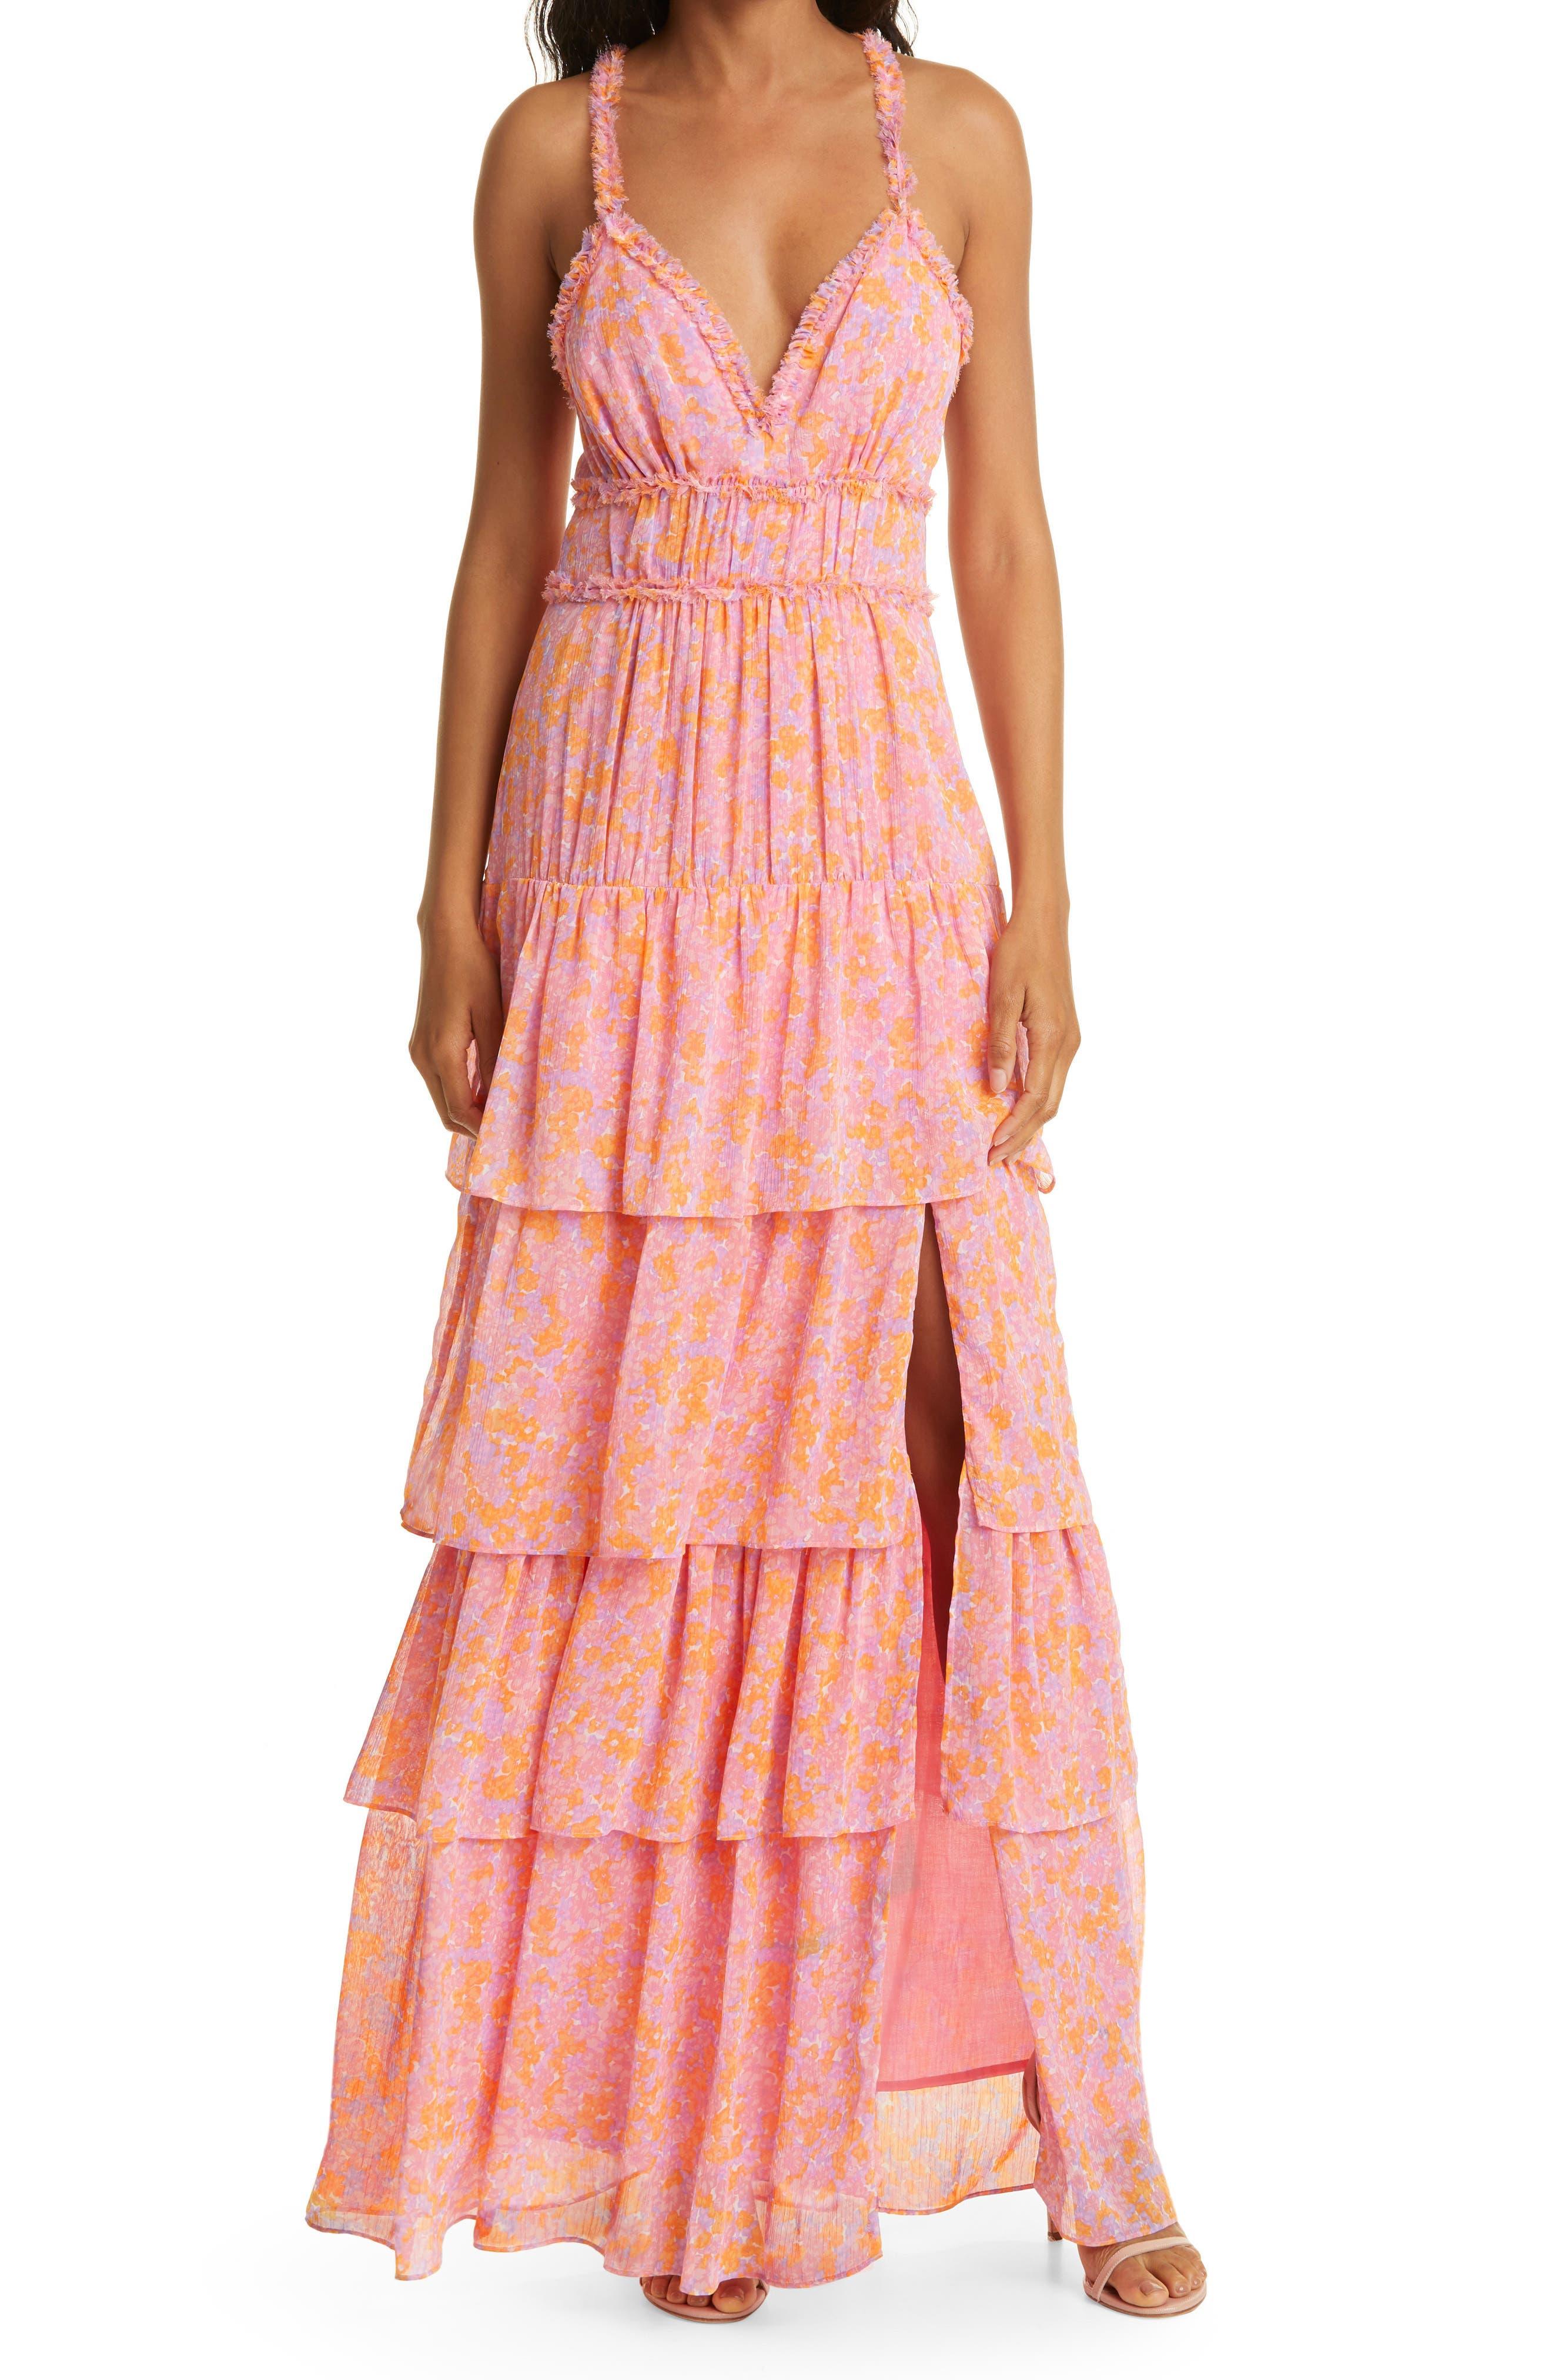 Athena Floral Print Tiered Sleeveless Dress